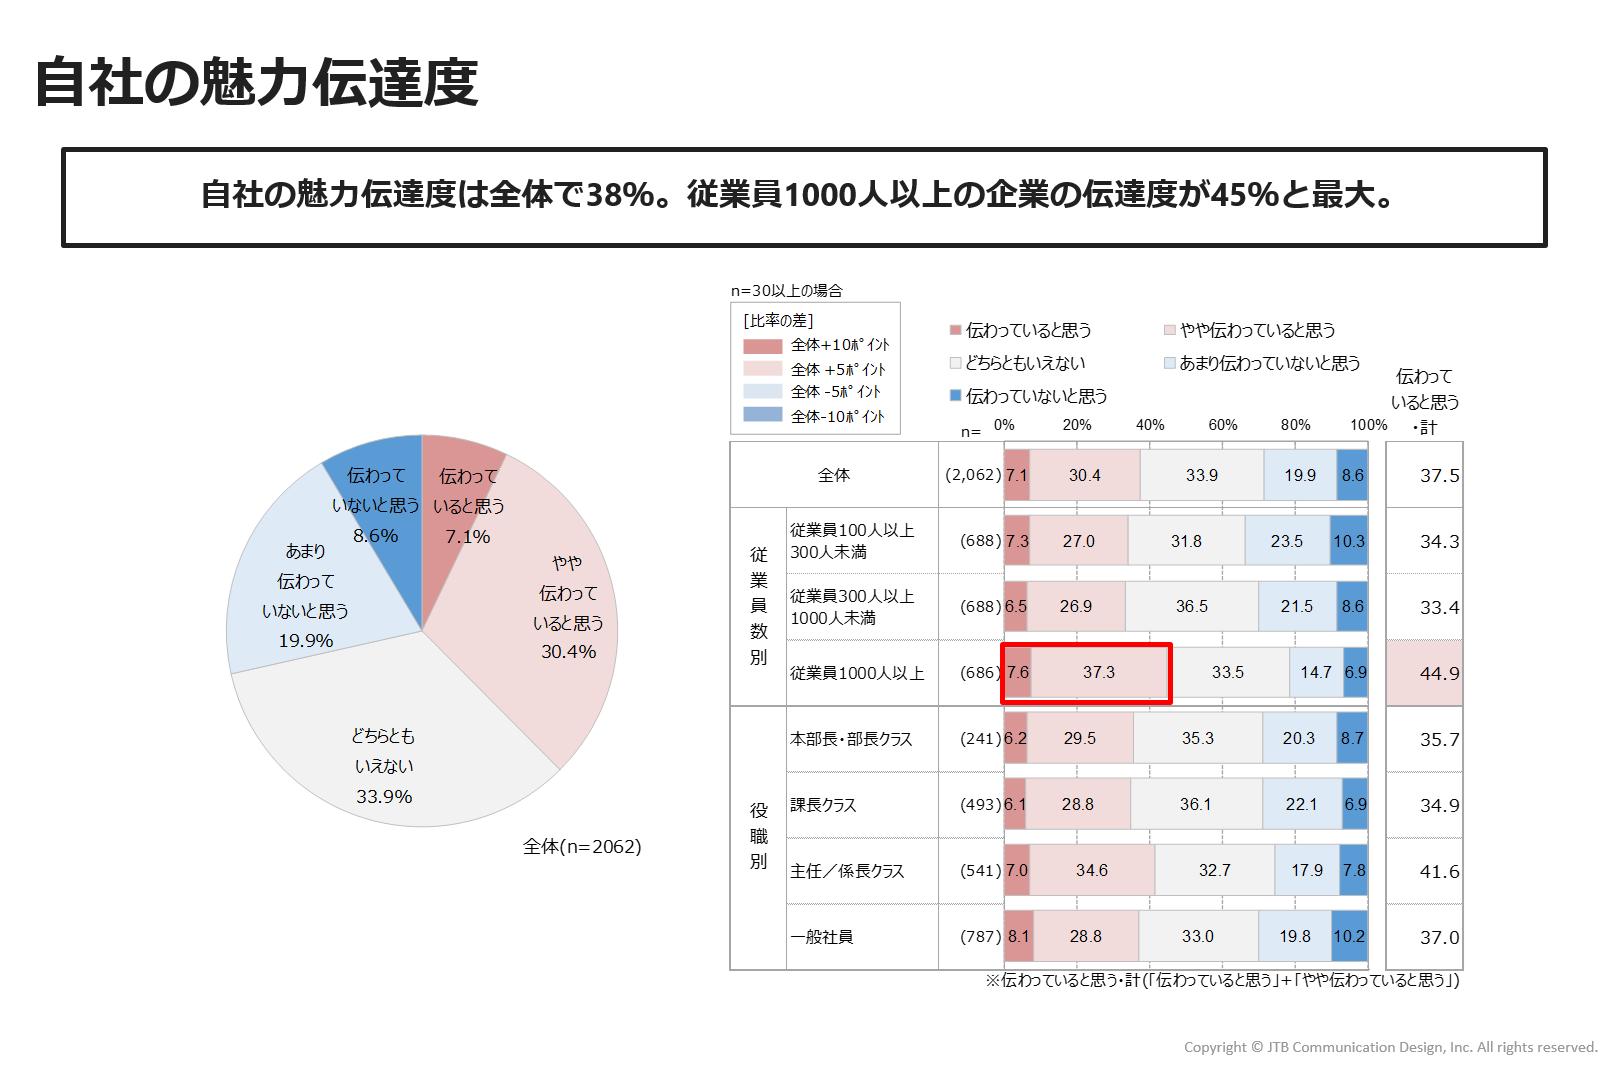 https://www.jtbcom.co.jp/article/img/commu-figure5.png